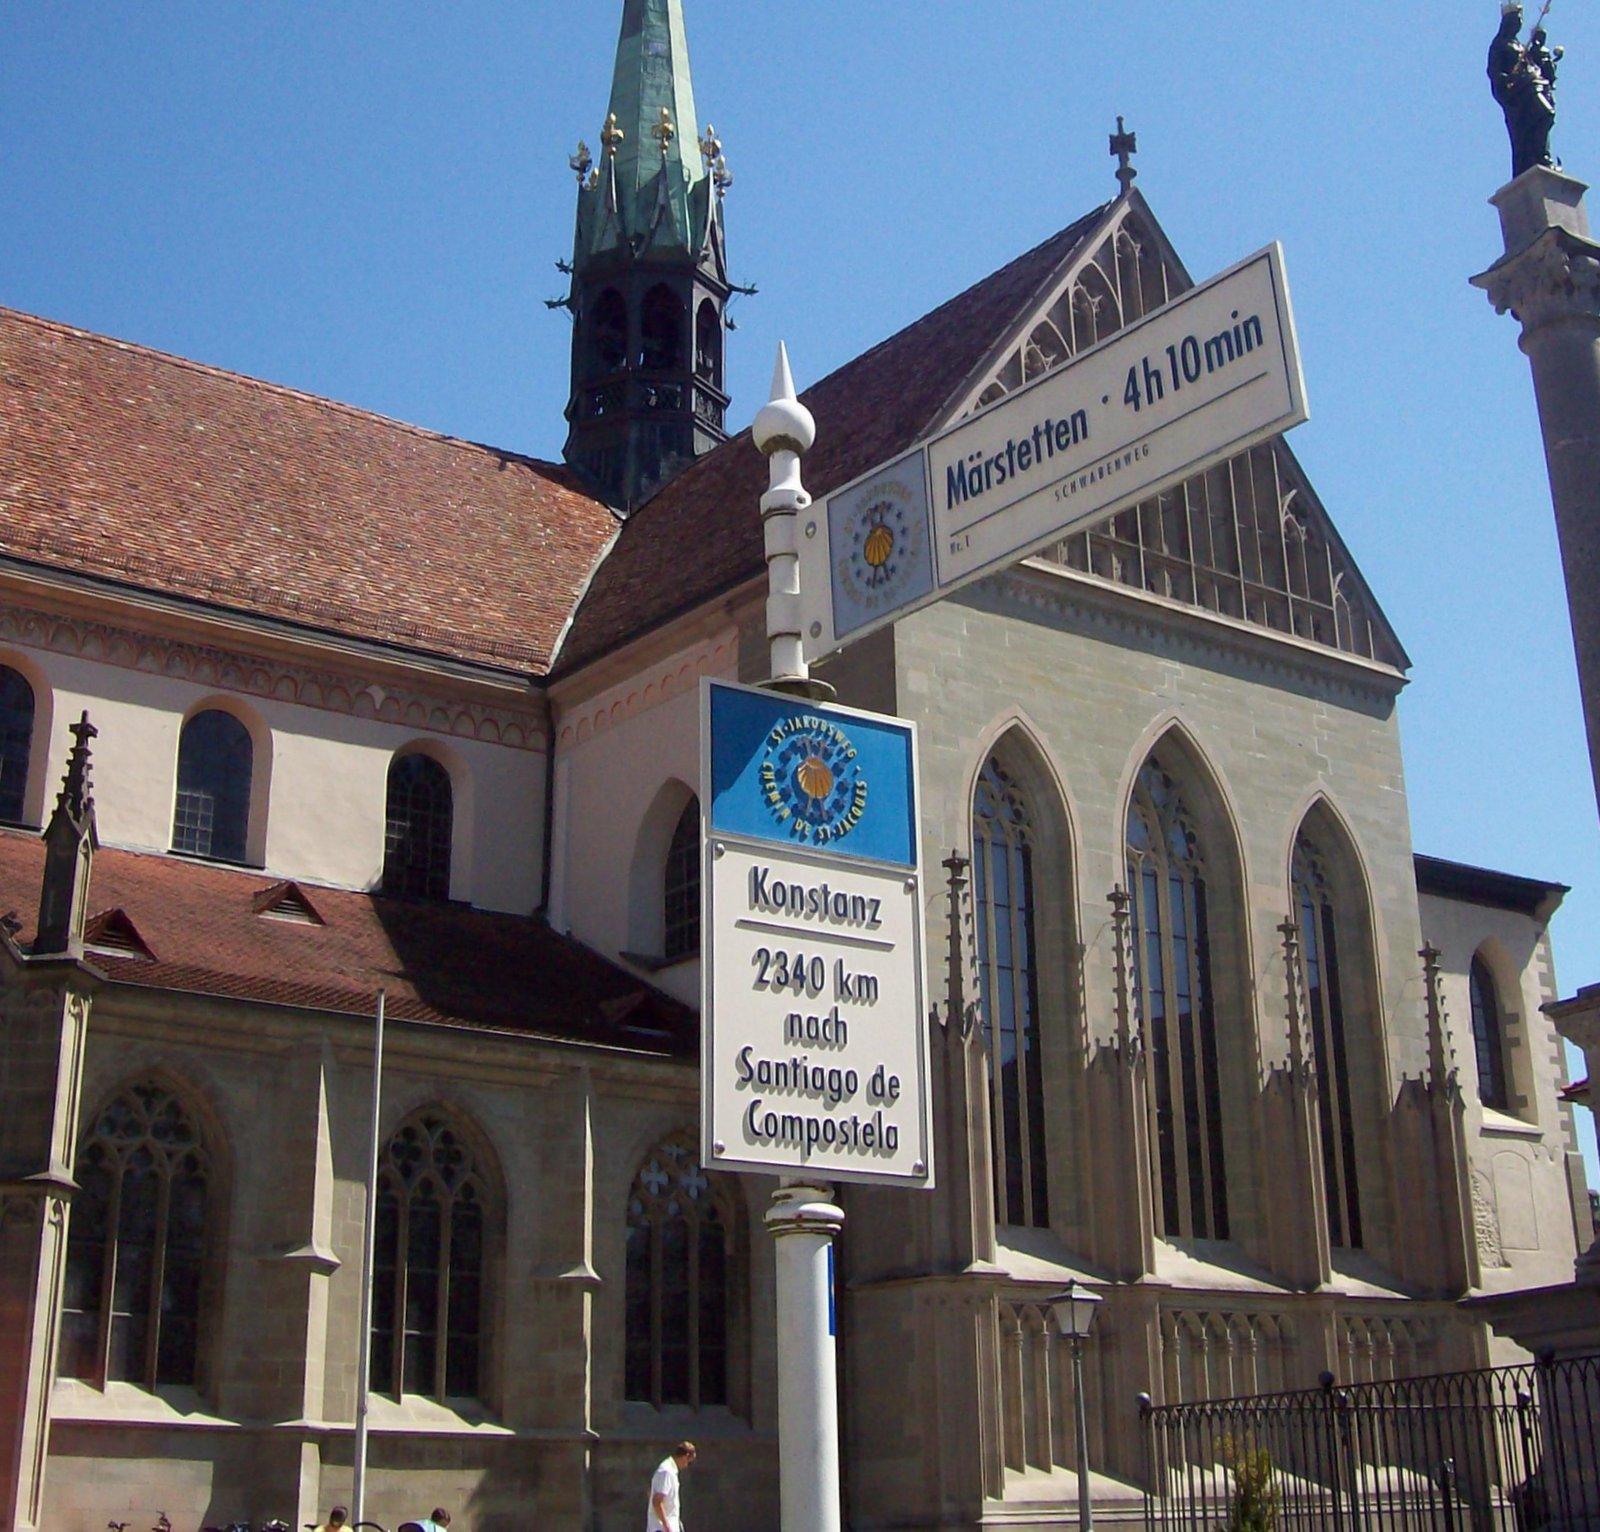 Wegweiser zum Jakobsweg in Konstanz